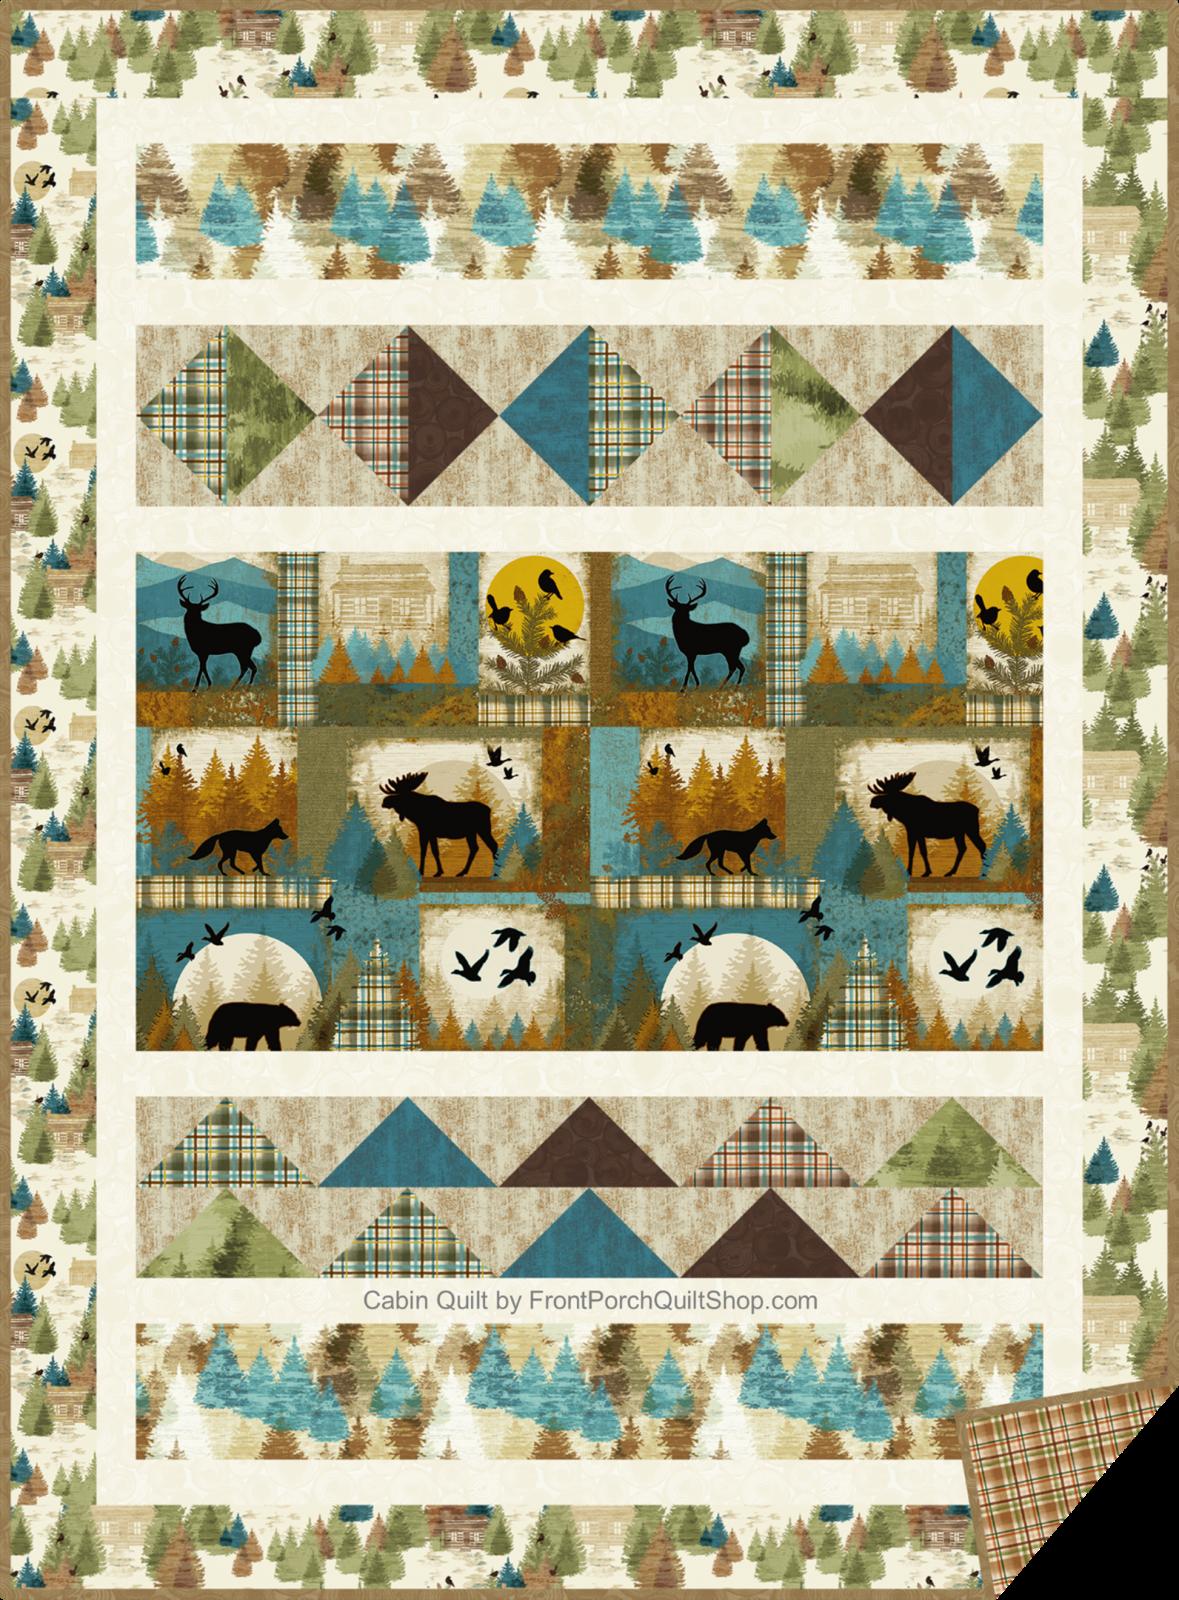 Cabin Quilt, pattern